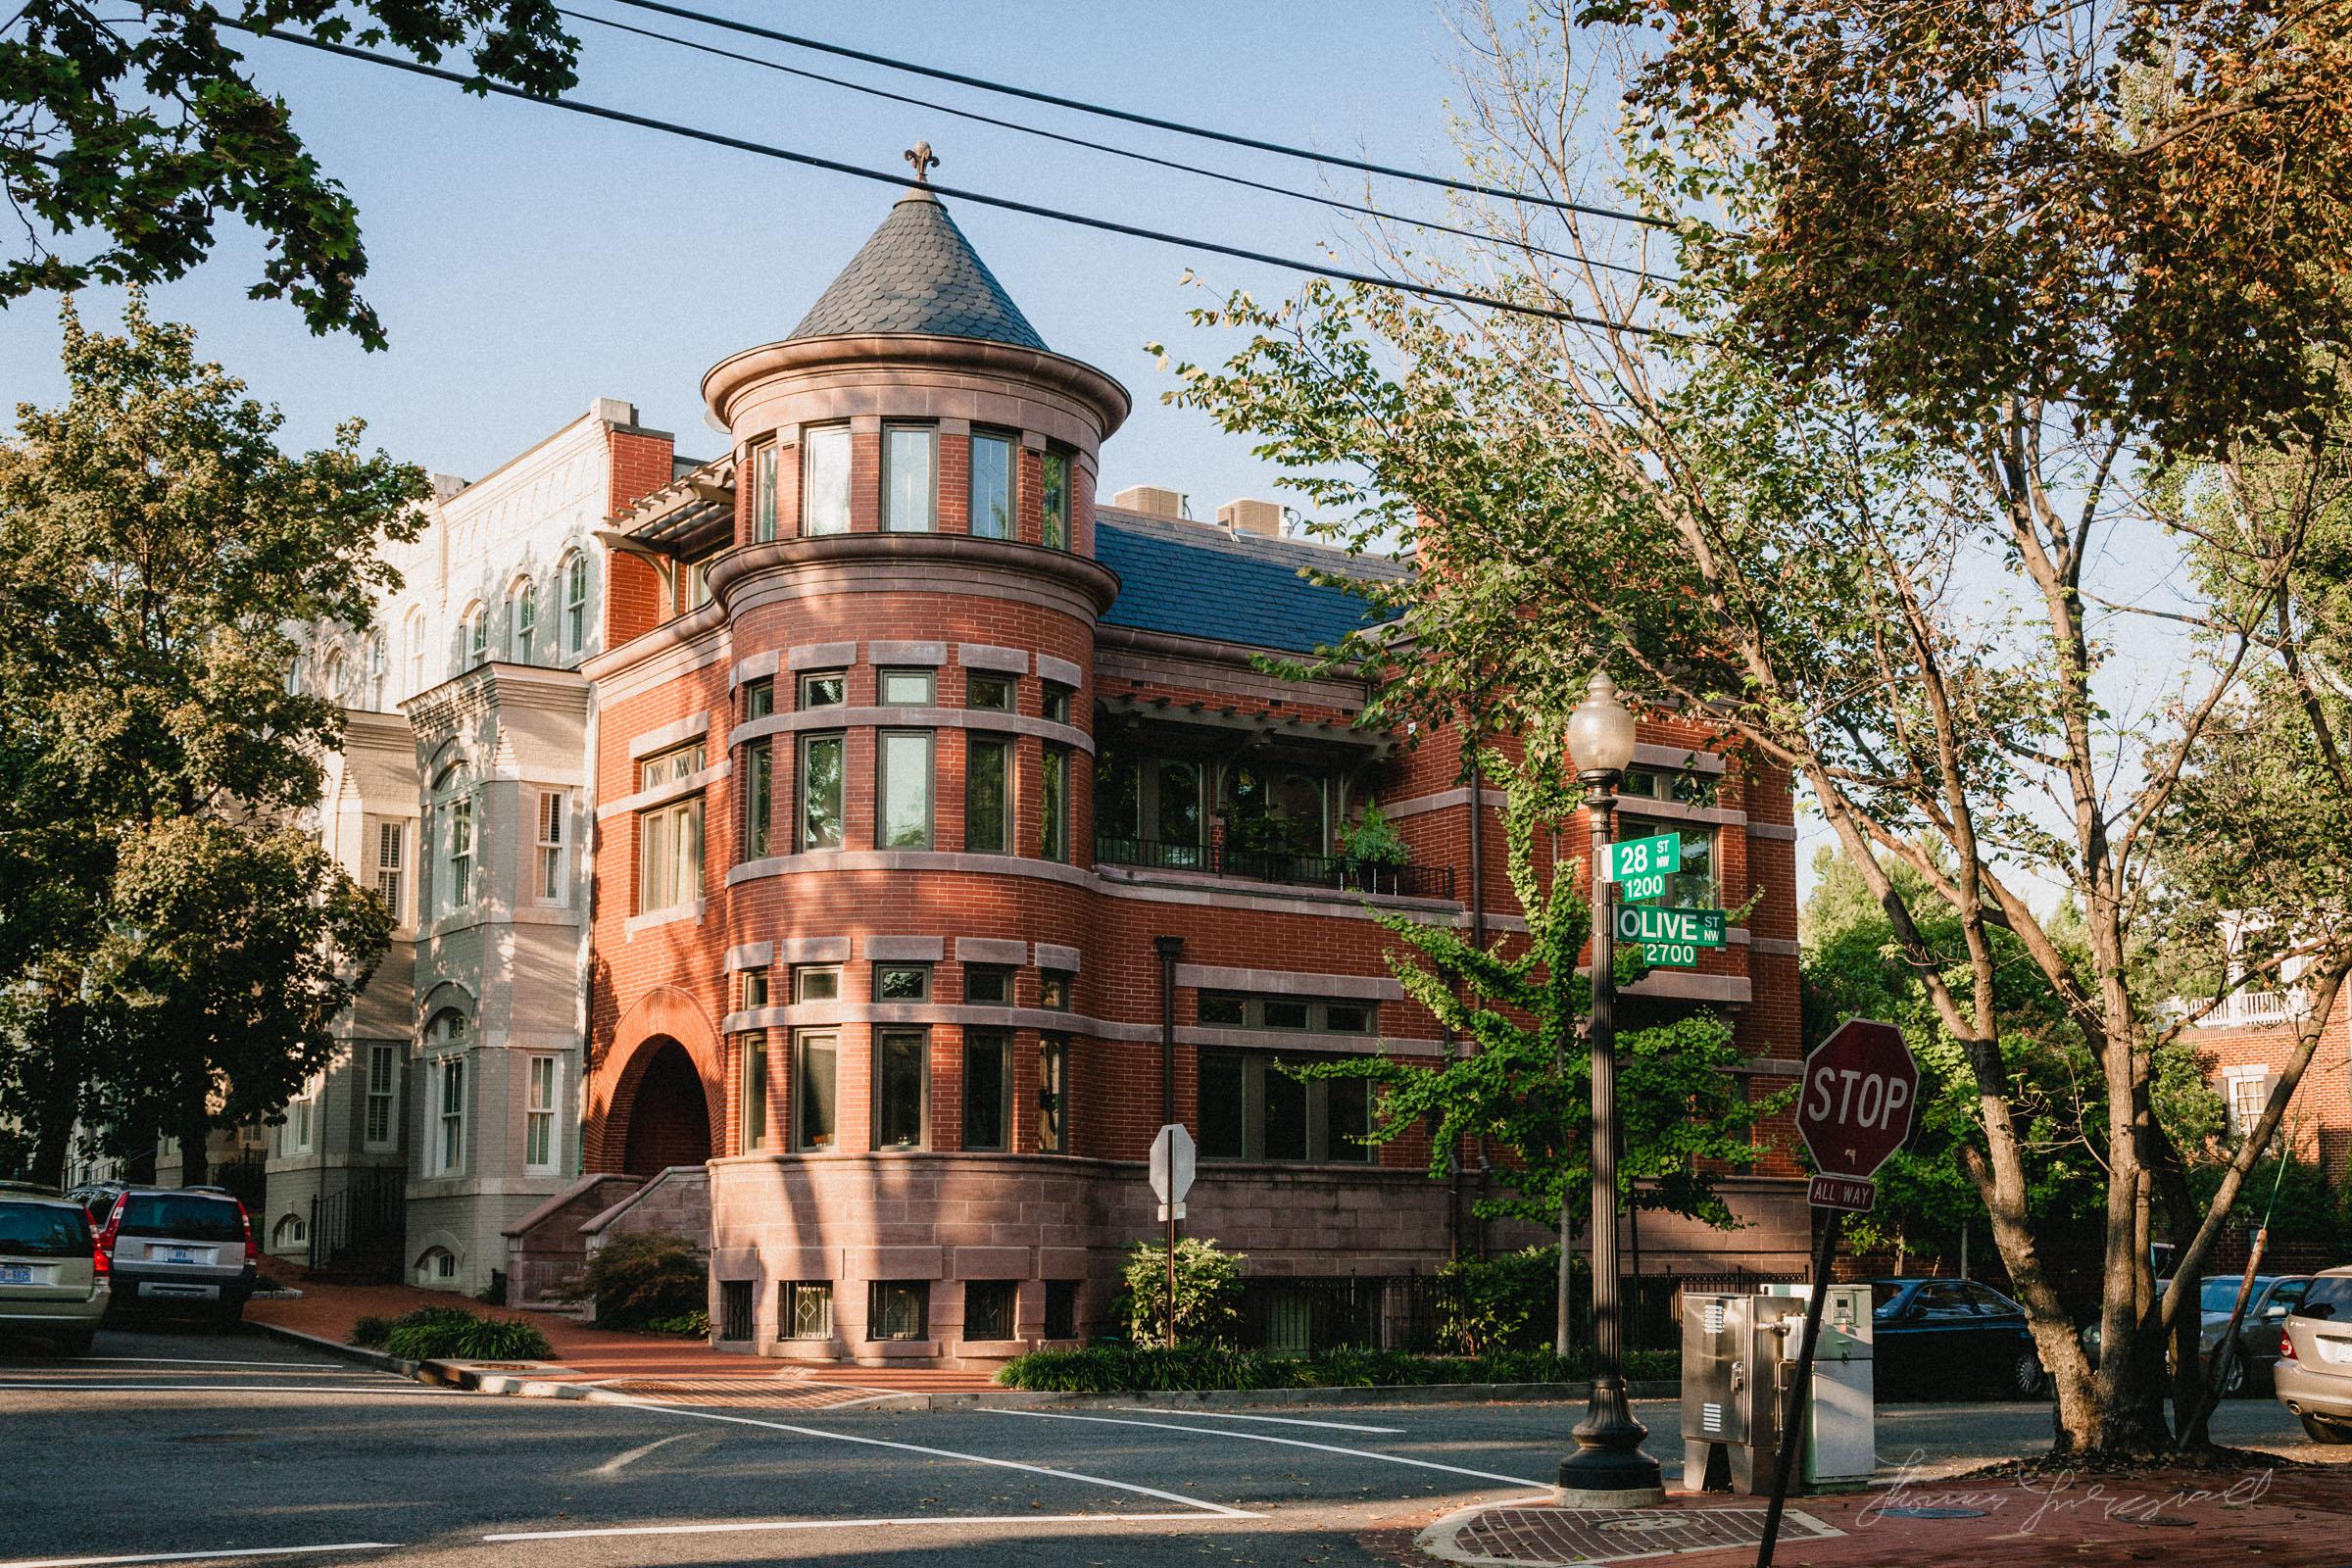 Red bricked building in Georgetown